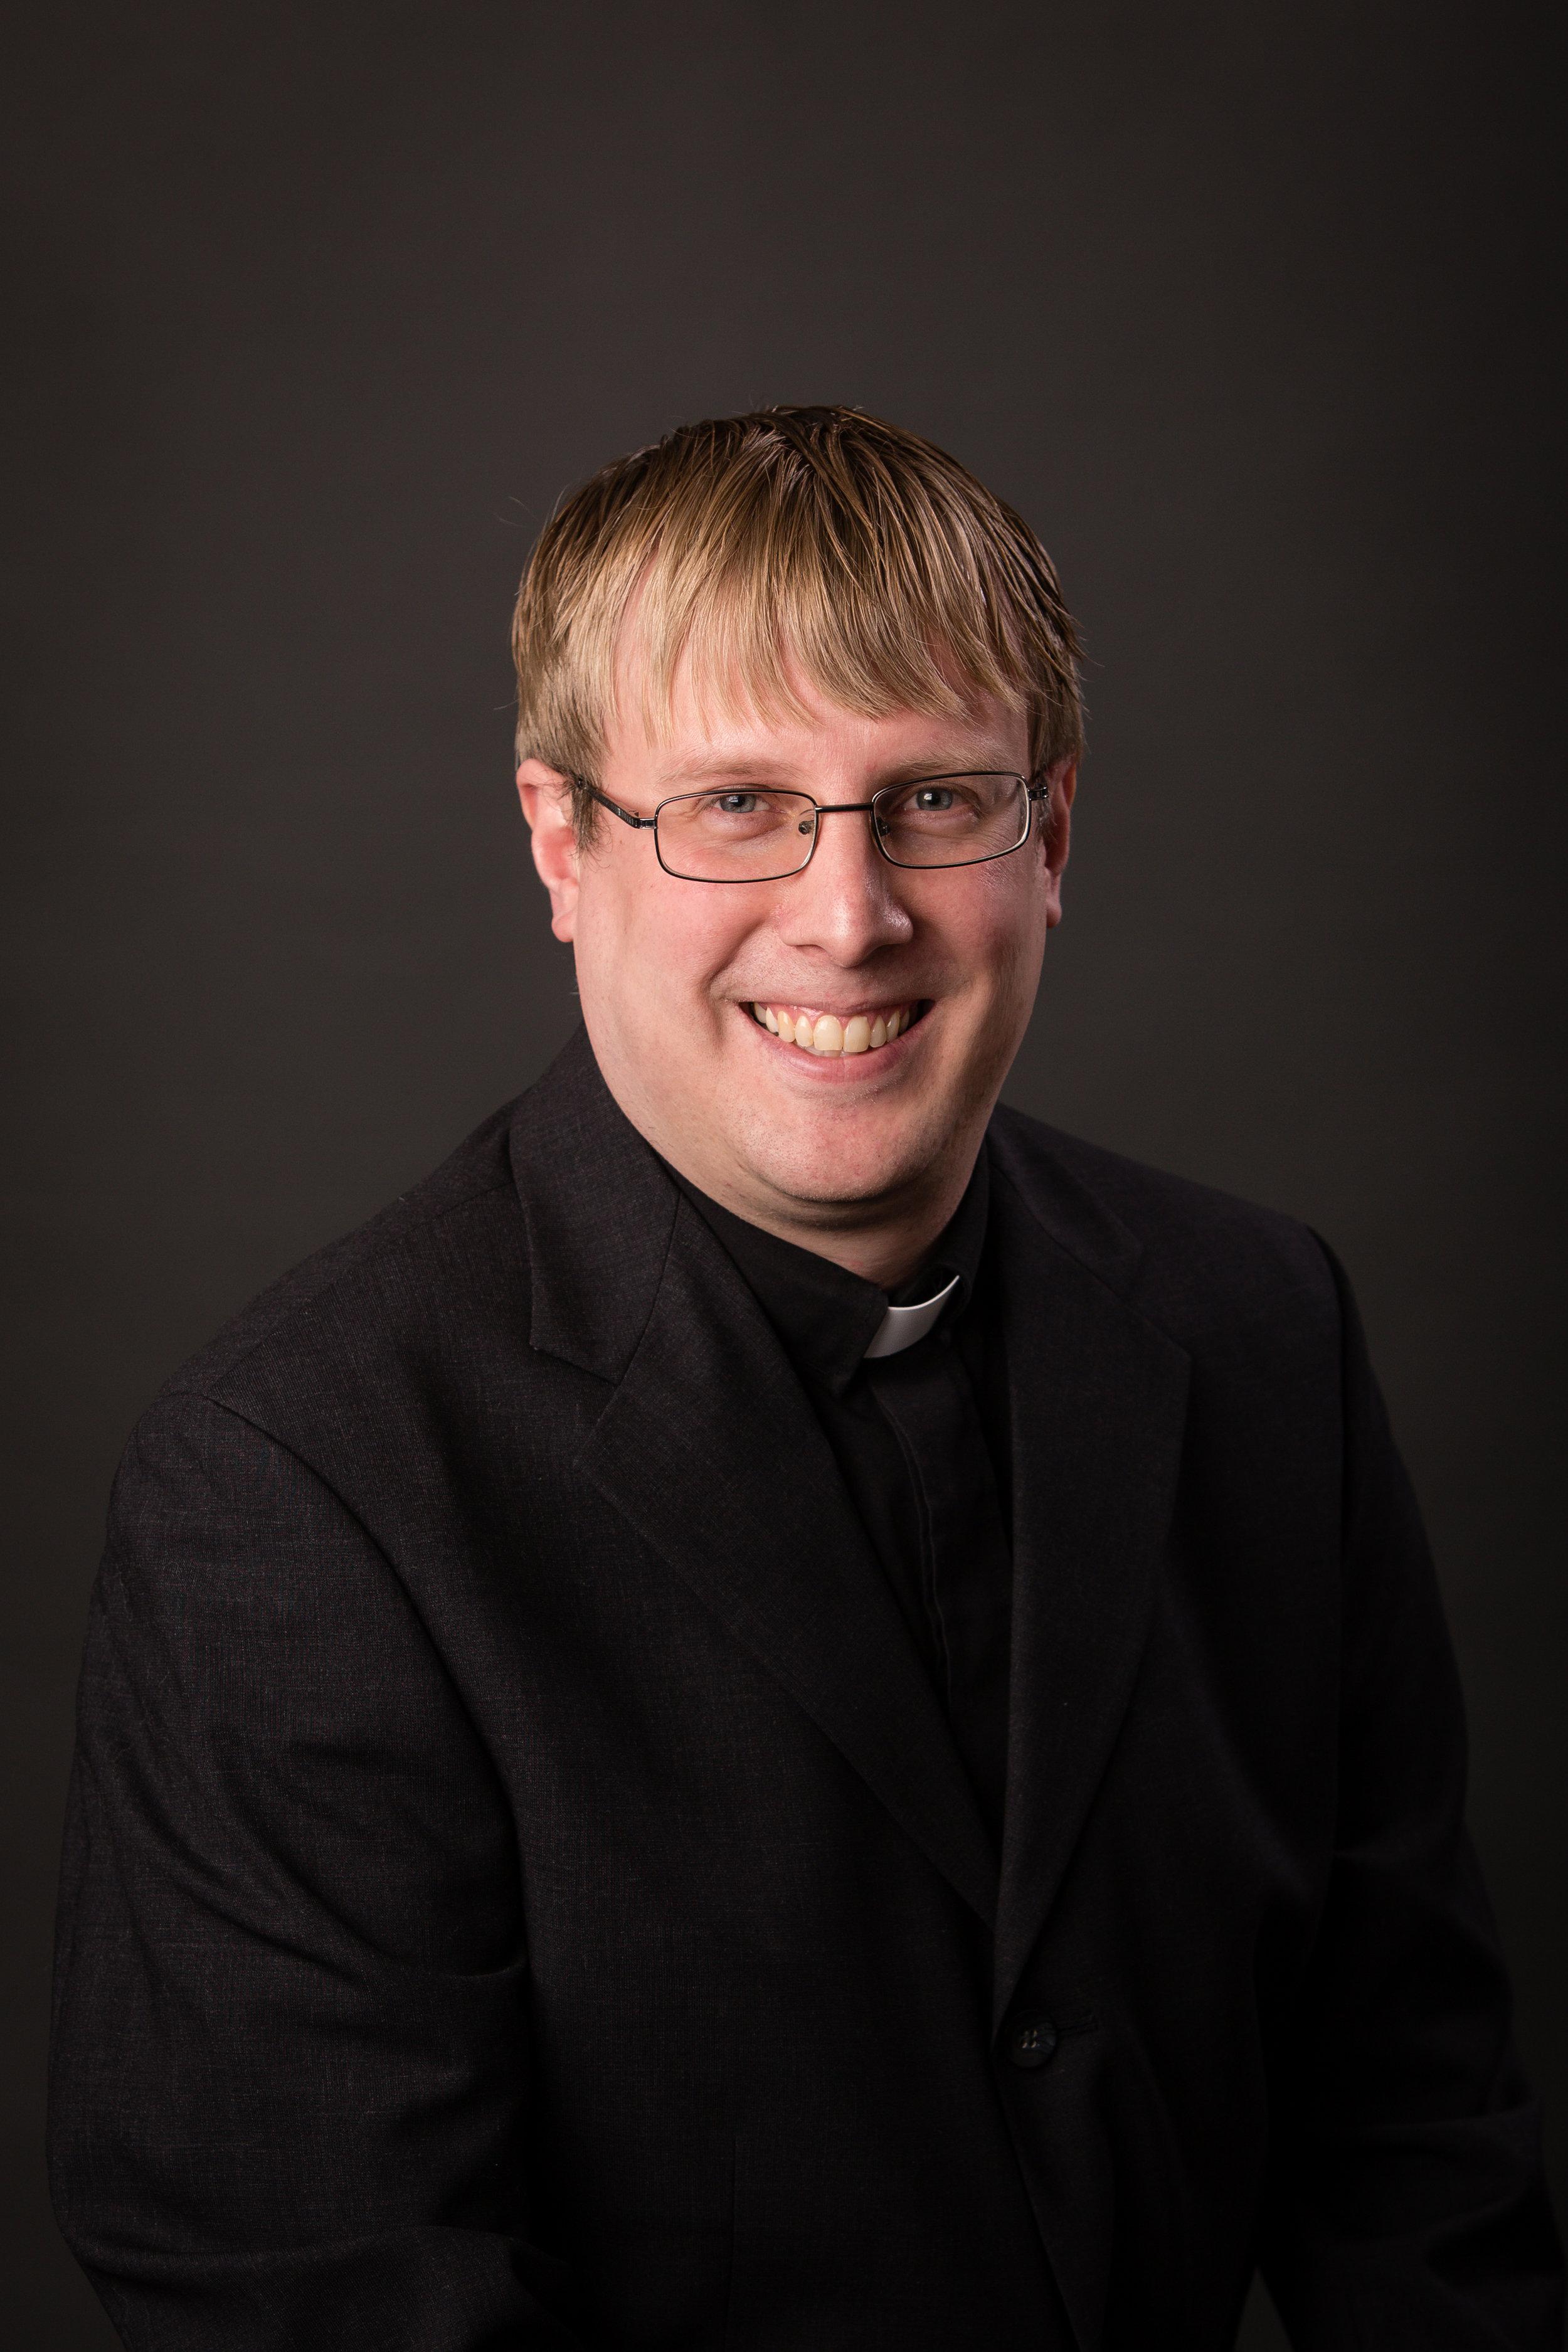 Rev. Jacob Stuenkel, Pastor